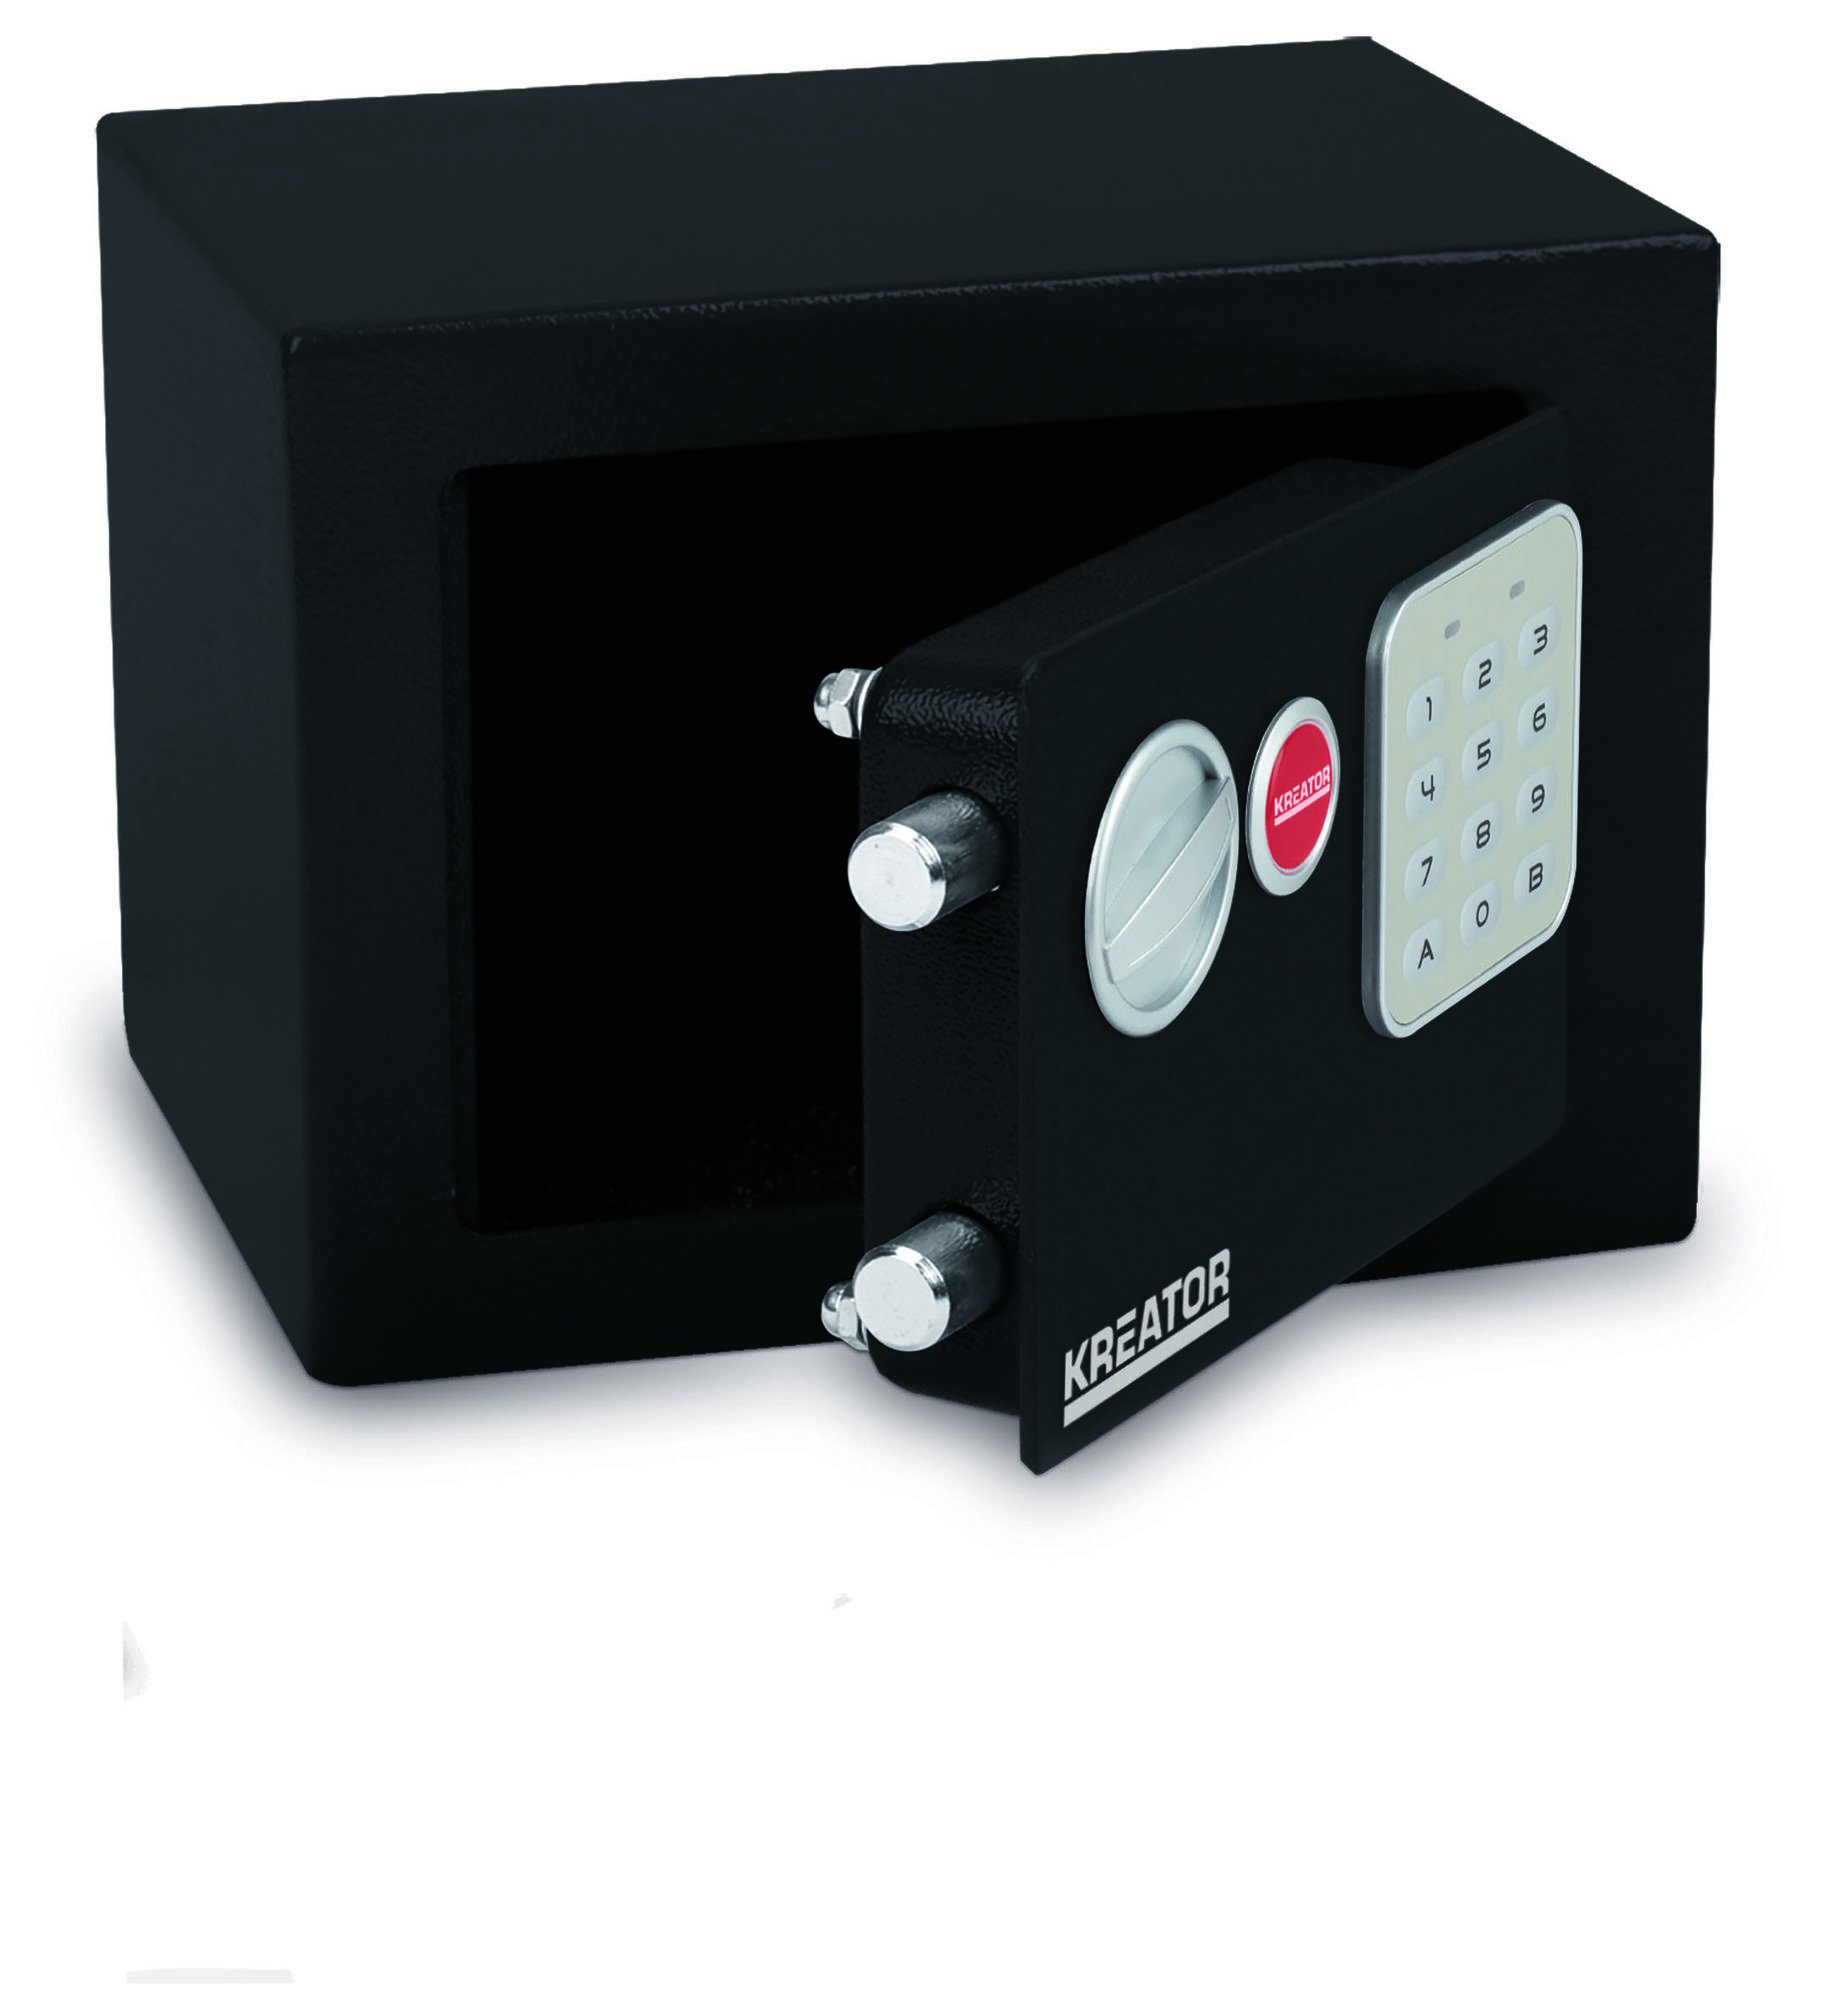 Varo MOTSA07EL Elektronische kluis 17 x 23 x 17 cm | Mini kluis / geldkluis